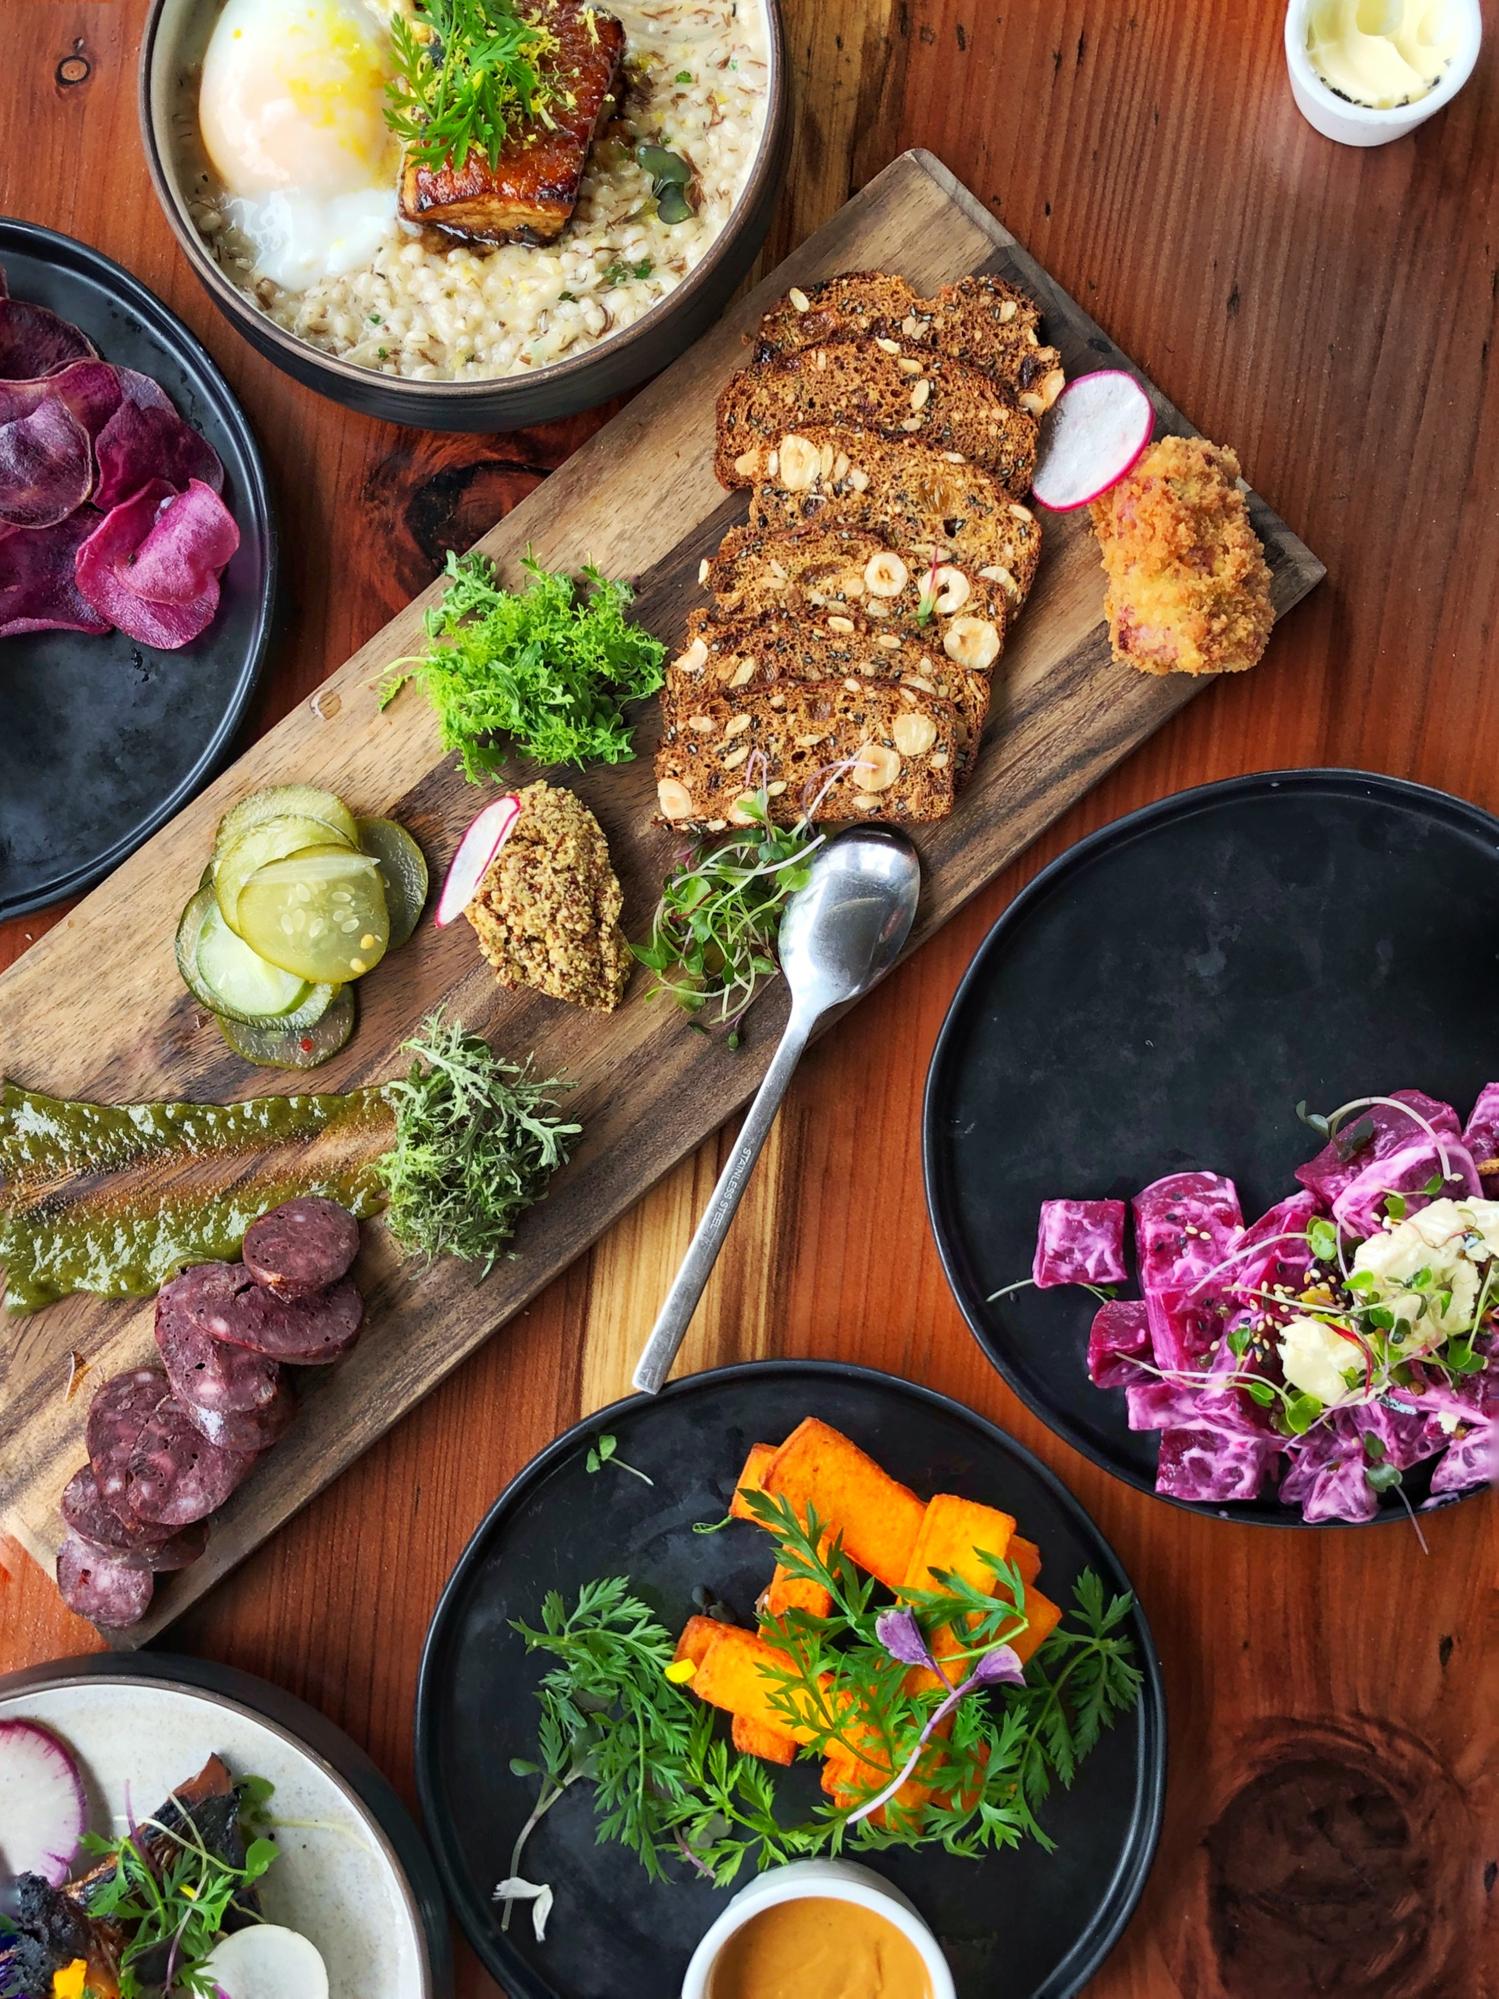 Maui-based-farm-to-table-appetizers-1031796214_2077x2770.jpeg